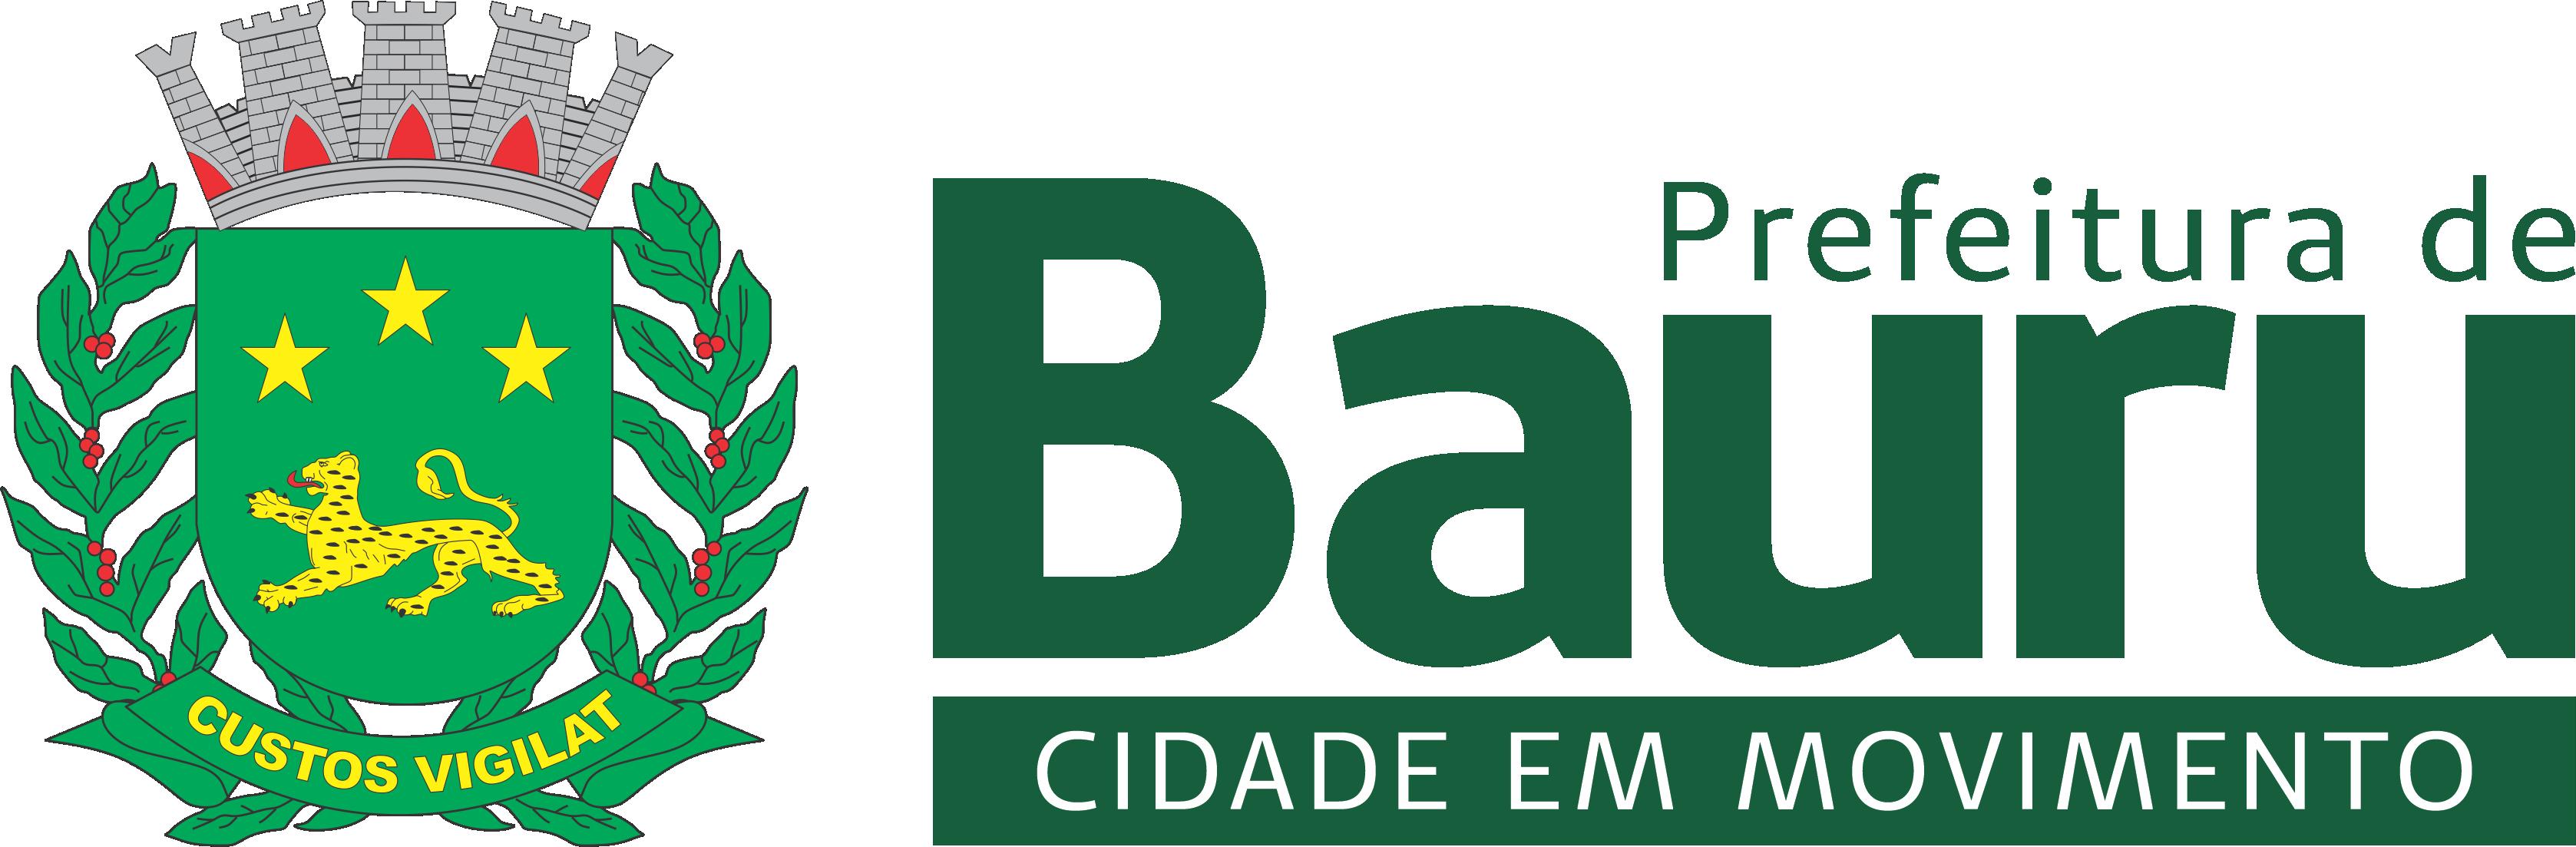 Prefeitura Municipal de Bauru